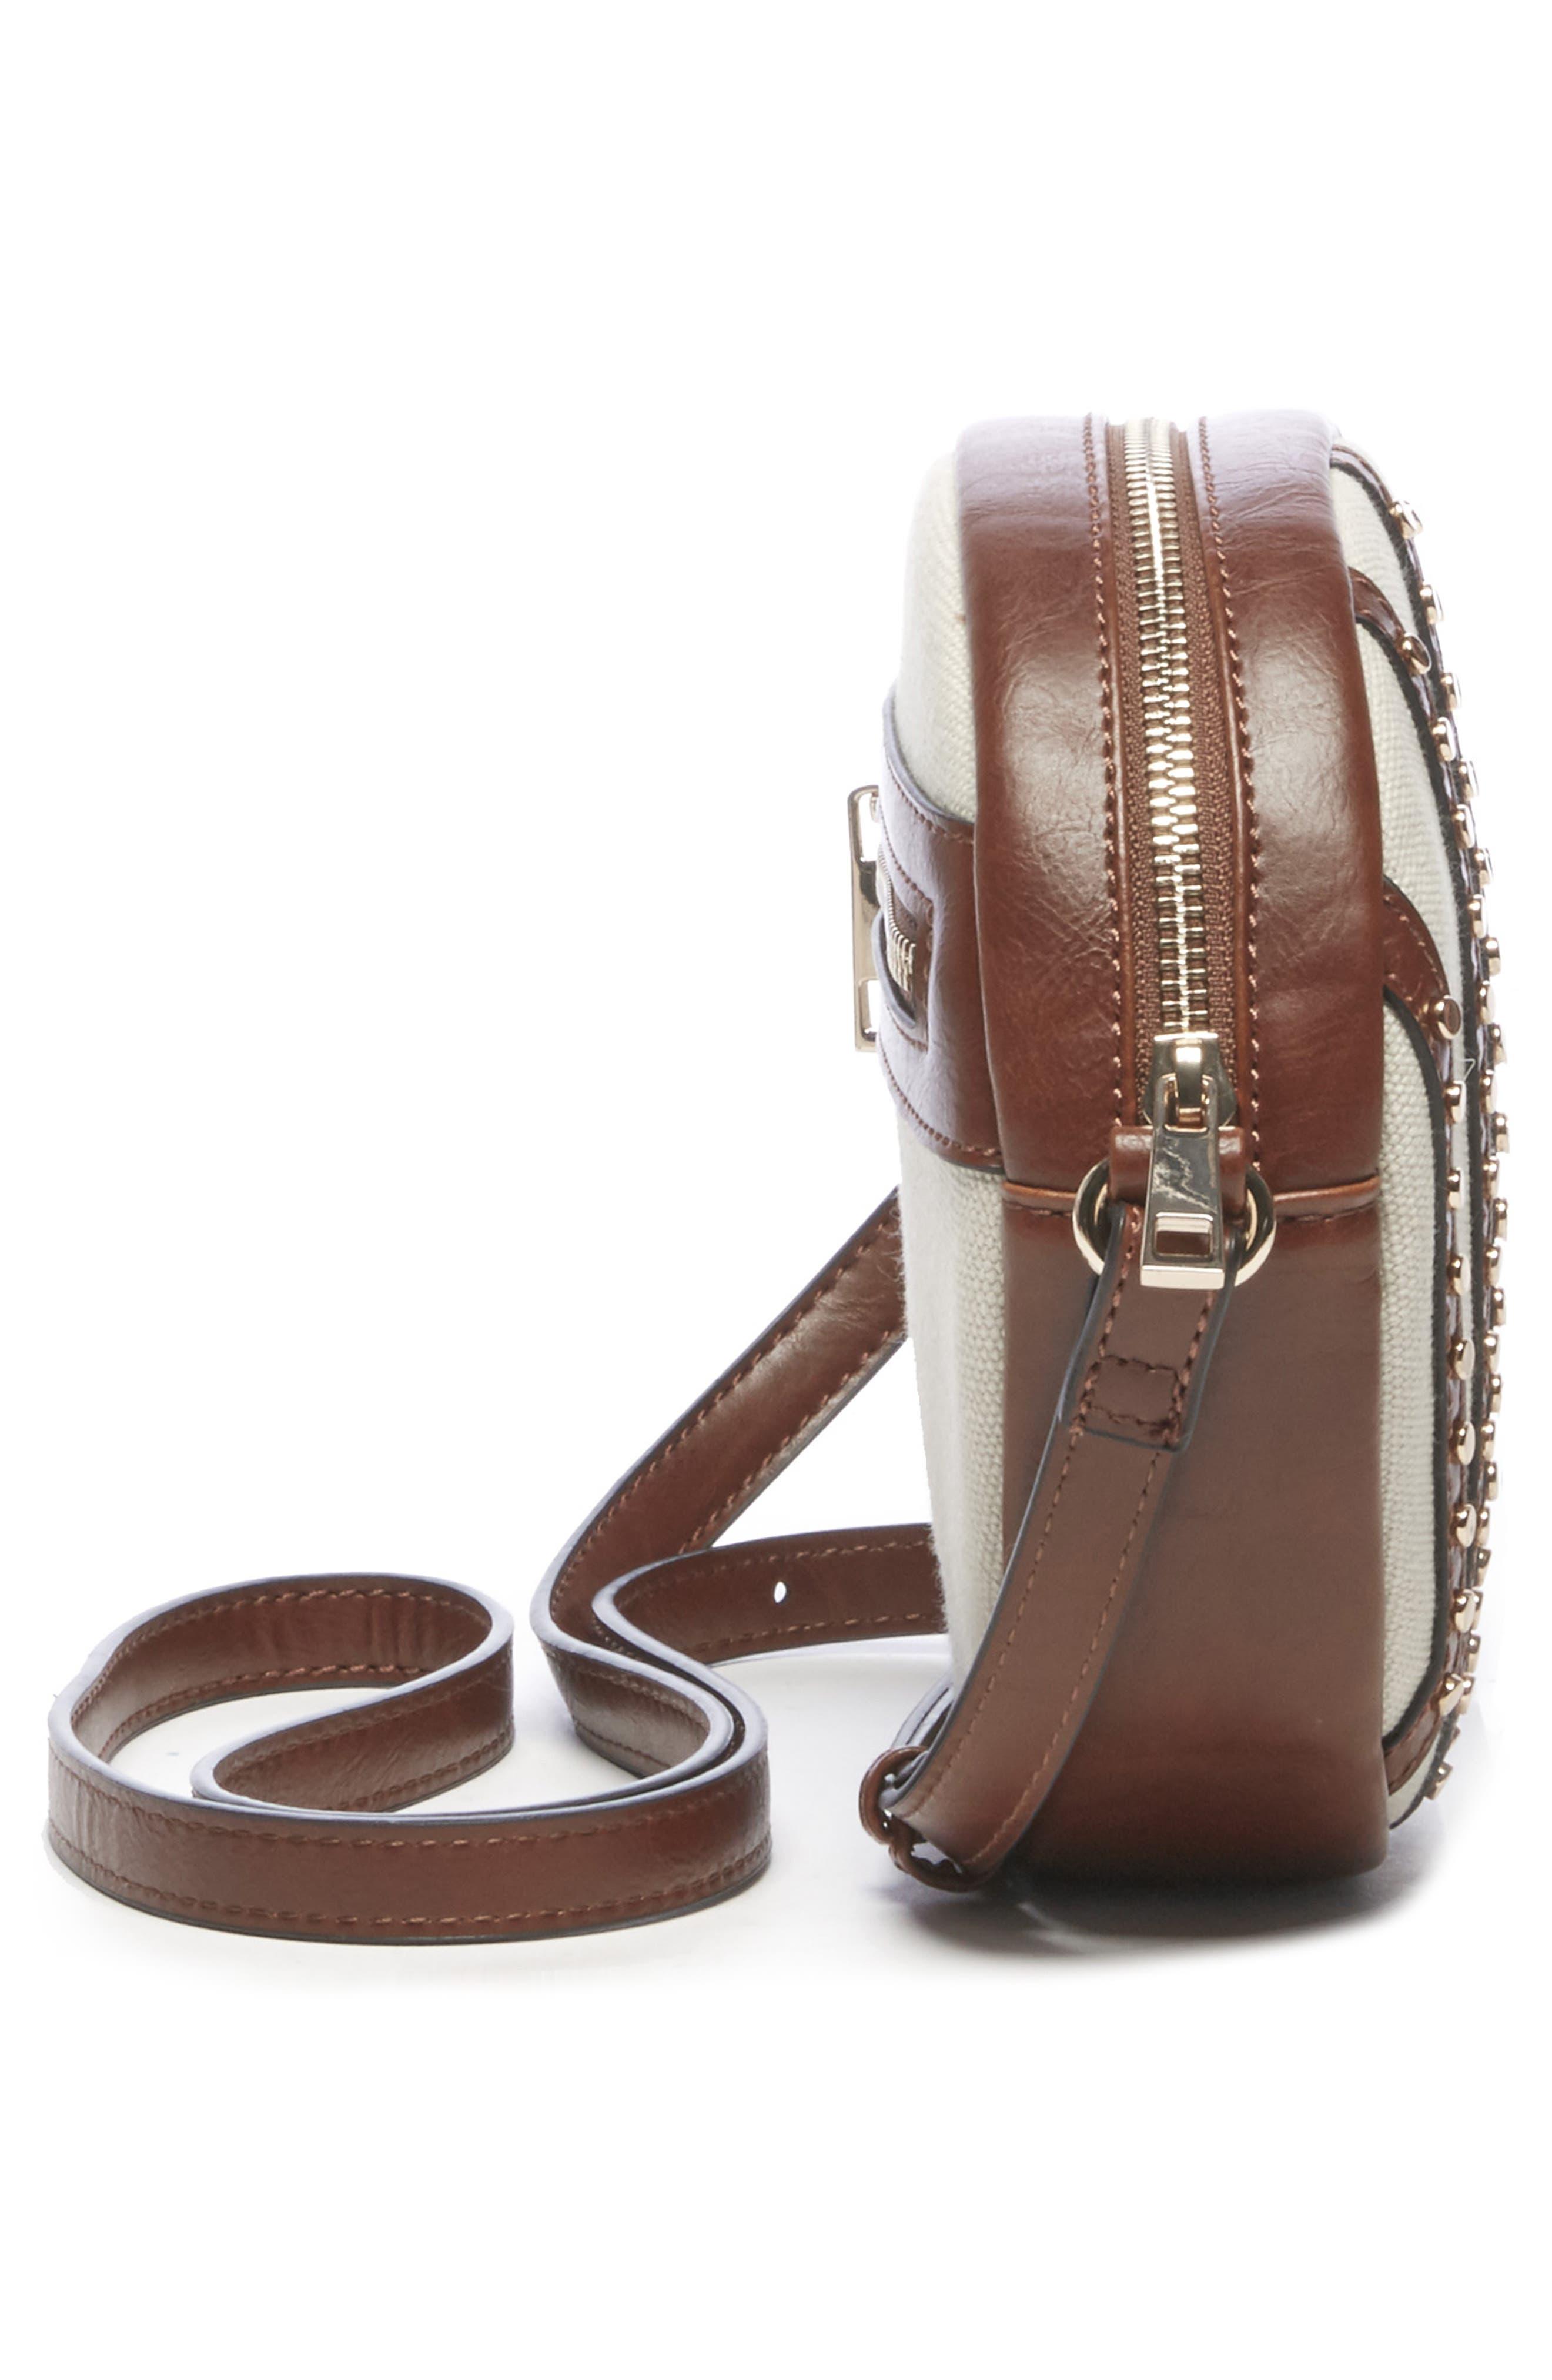 Aira Studded Crossbody Bag,                             Alternate thumbnail 4, color,                             NATURAL